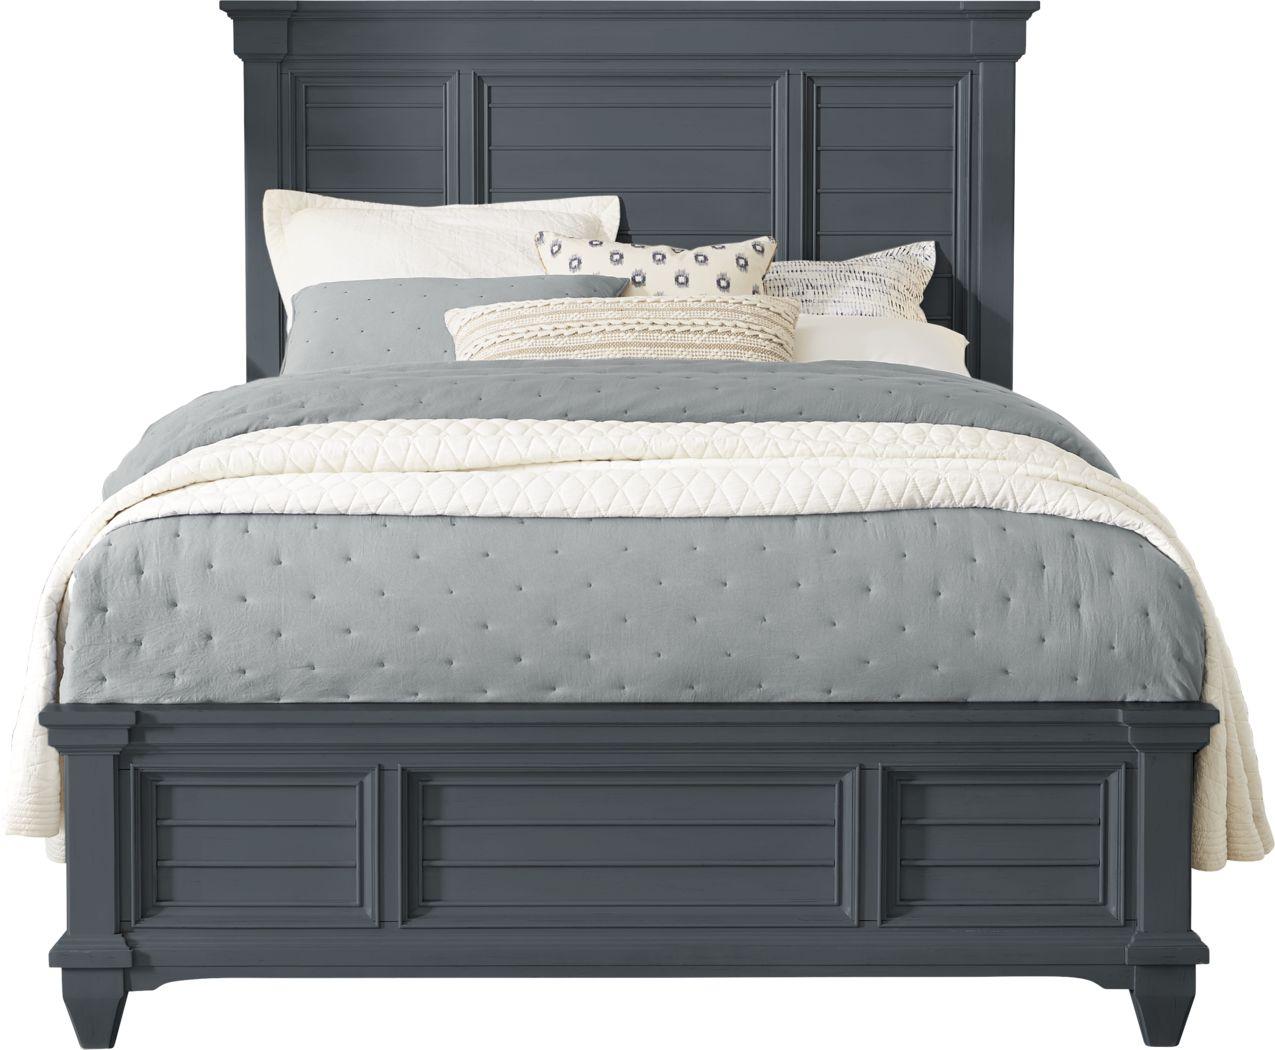 Hilton Head Graphite 3 Pc King Panel Bed